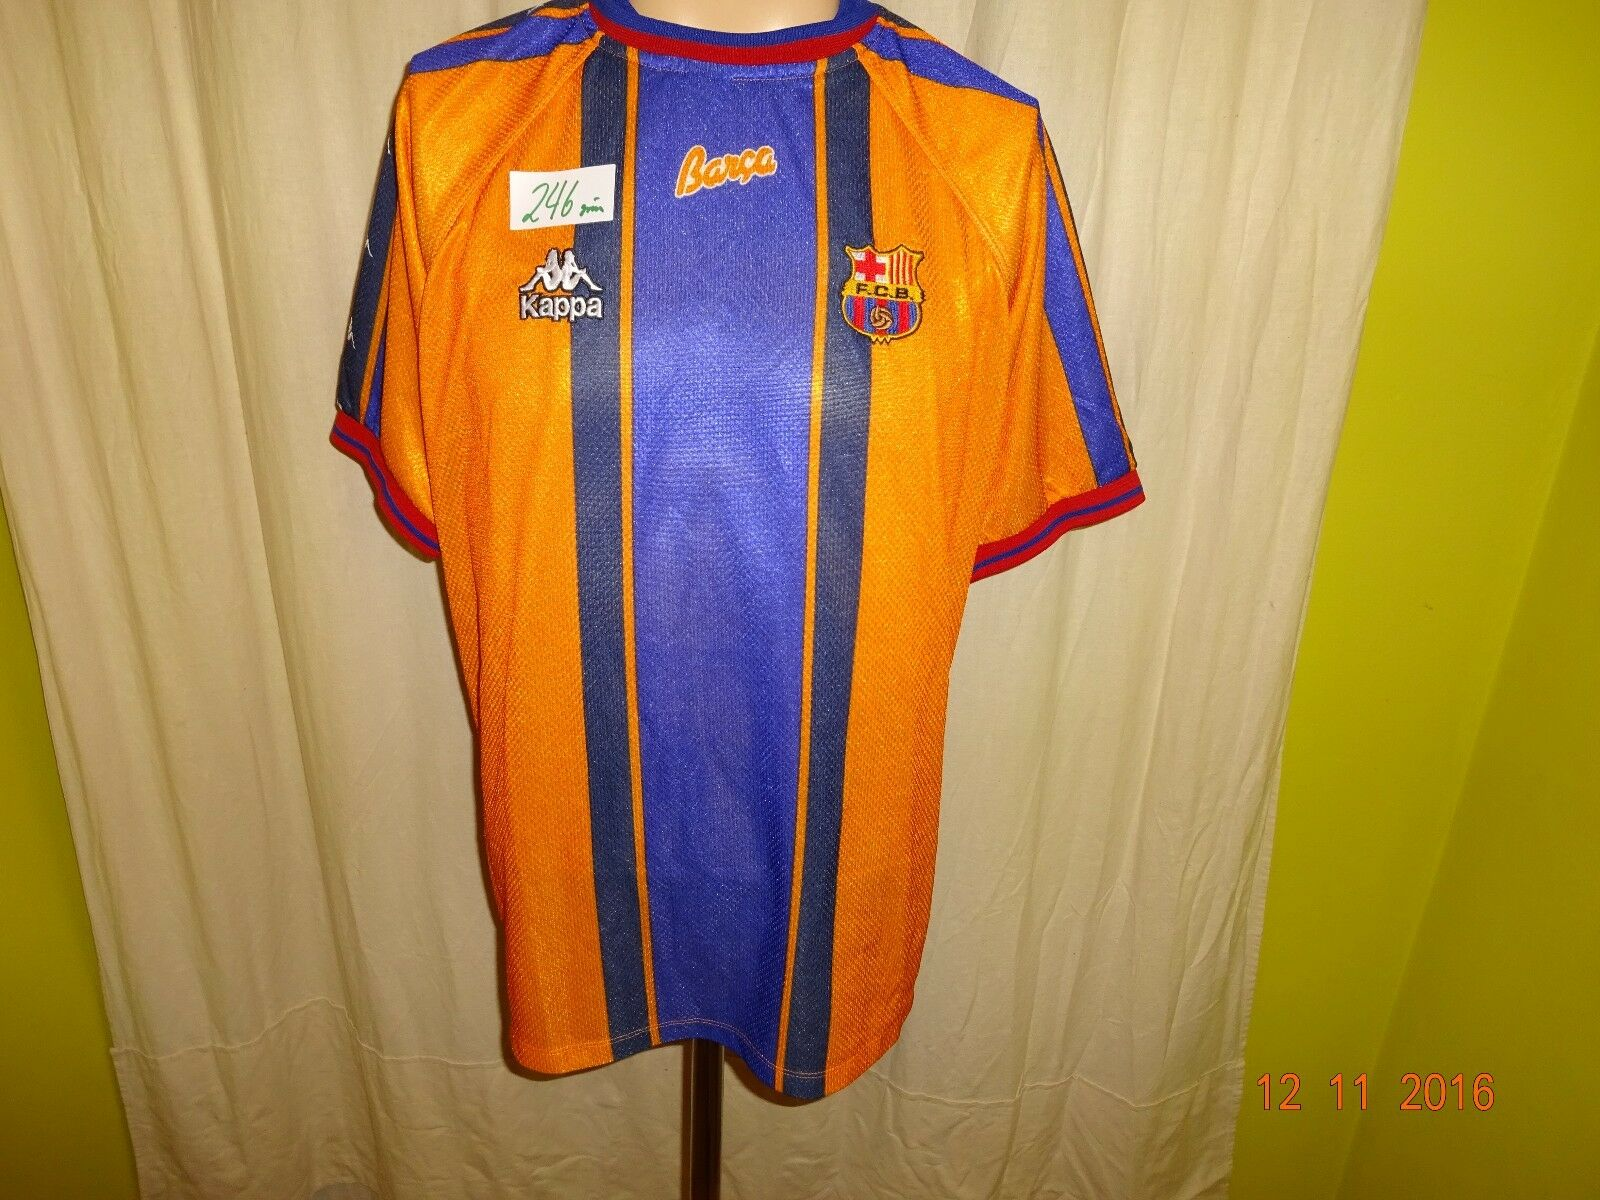 FC Barcelona Original Kappa Kappa Kappa Auswärts Trikot 1997 98  ohne Hauptsponsor  Gr.L 6ee4b1